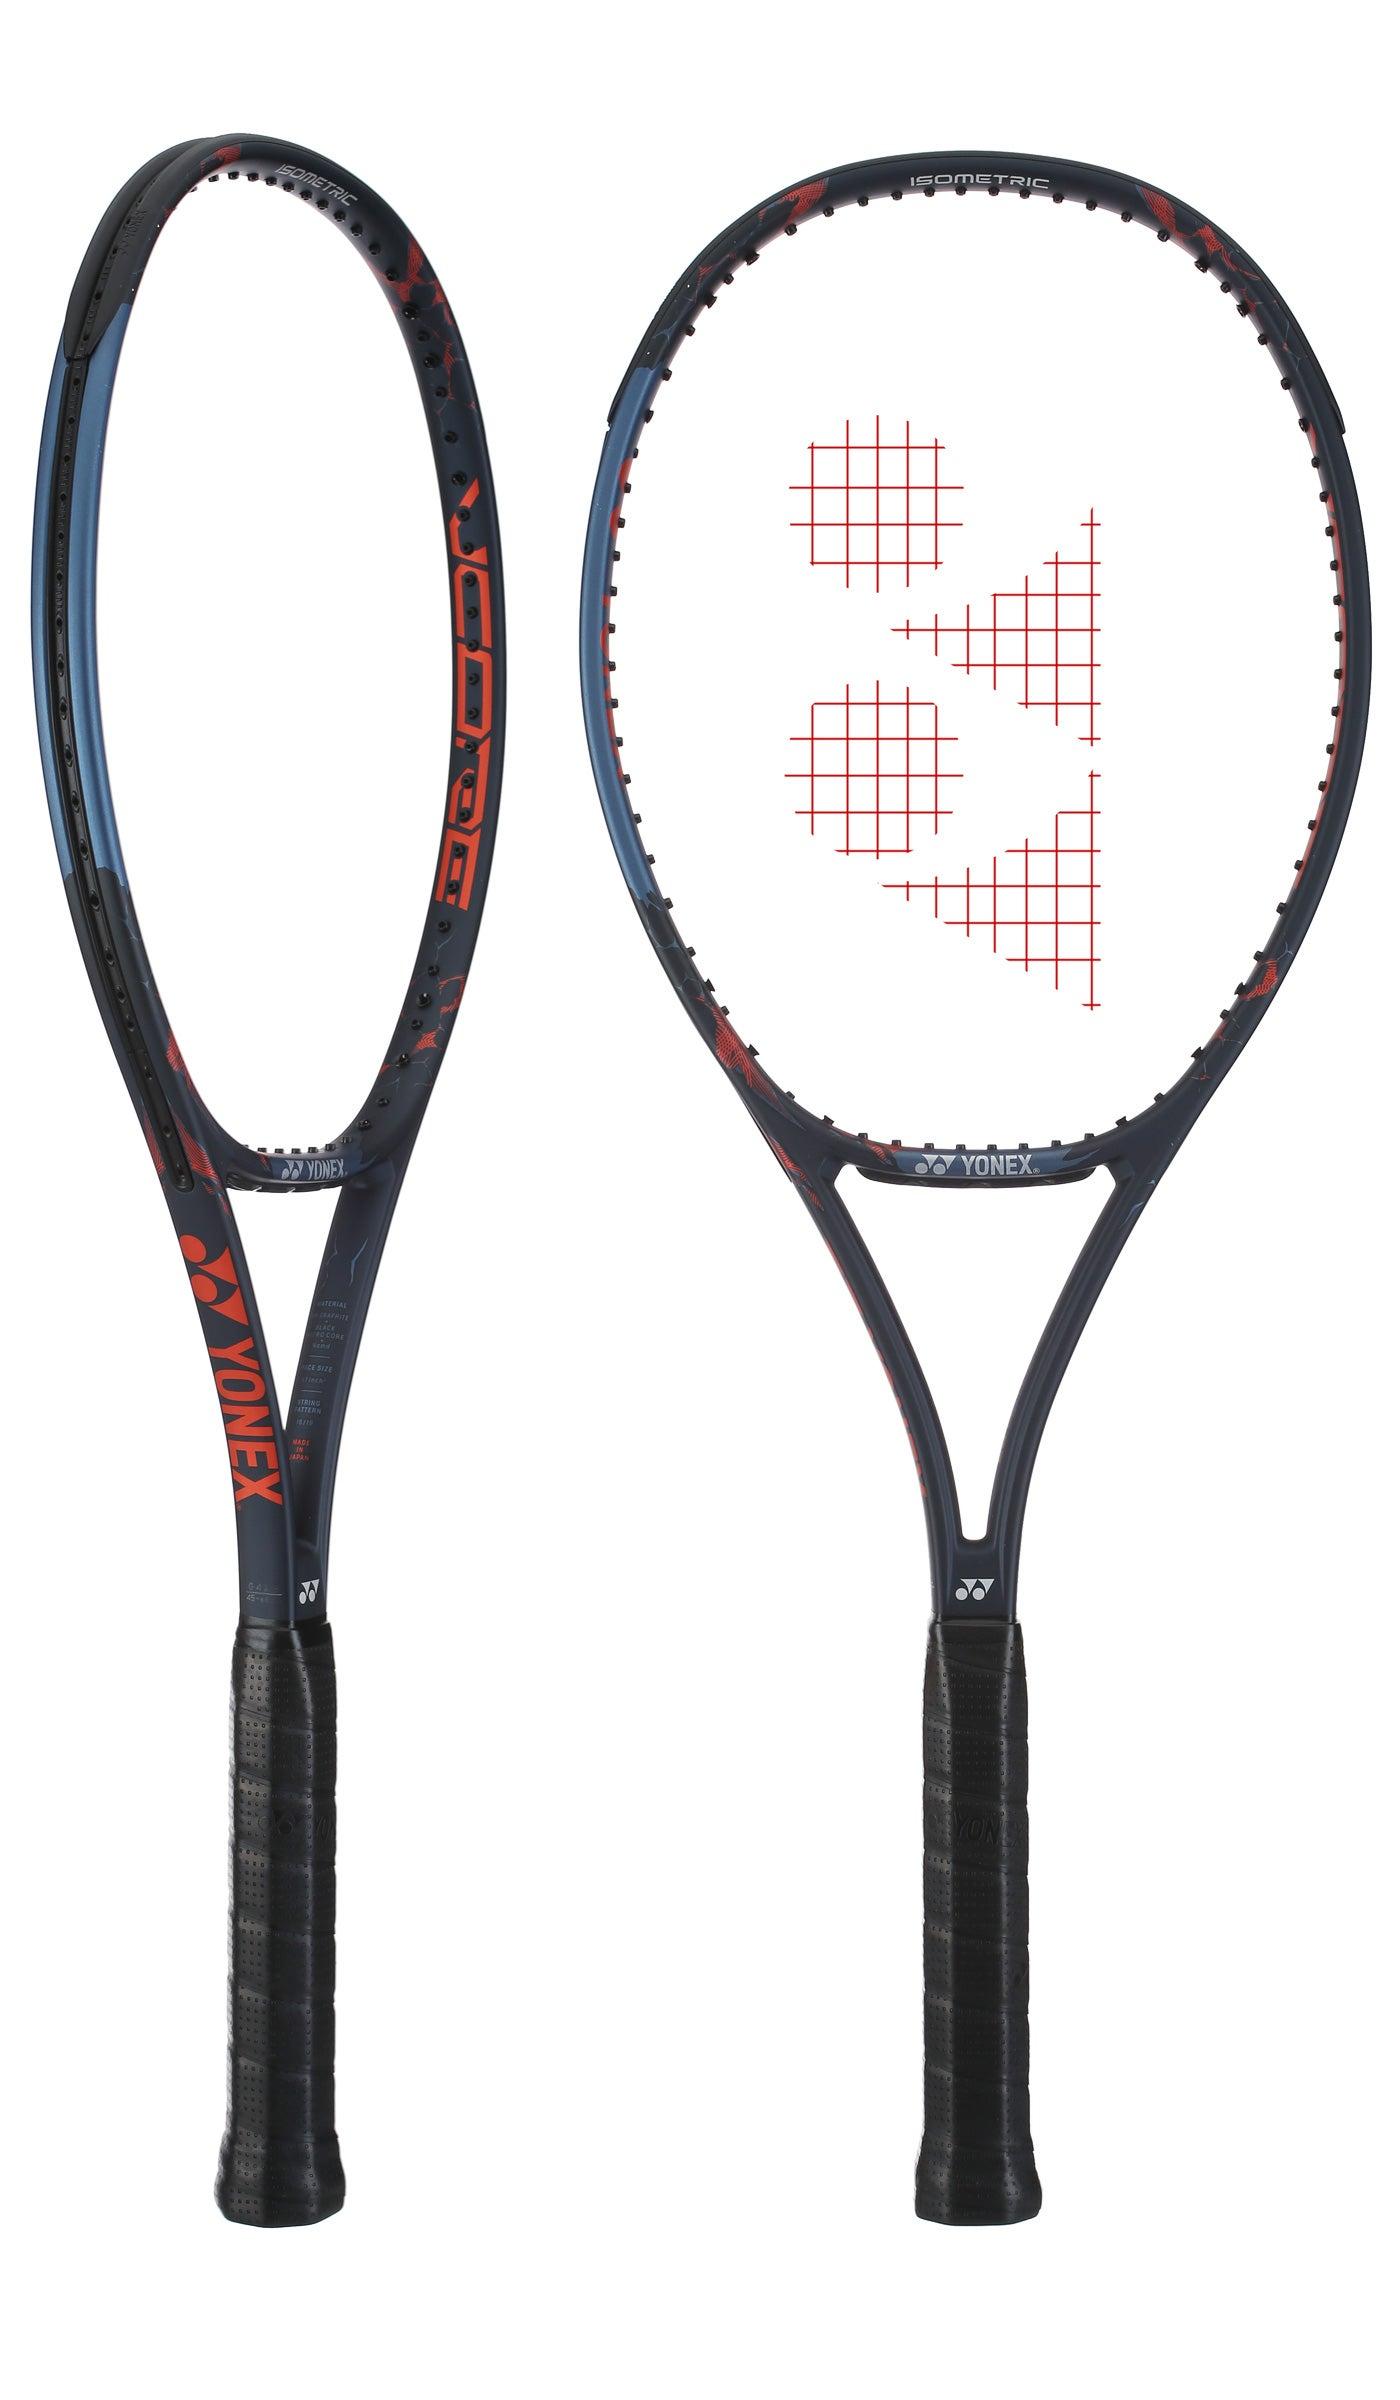 Yonex VCORE Pro 97 (290g) Racket - Tennis Warehouse Europe